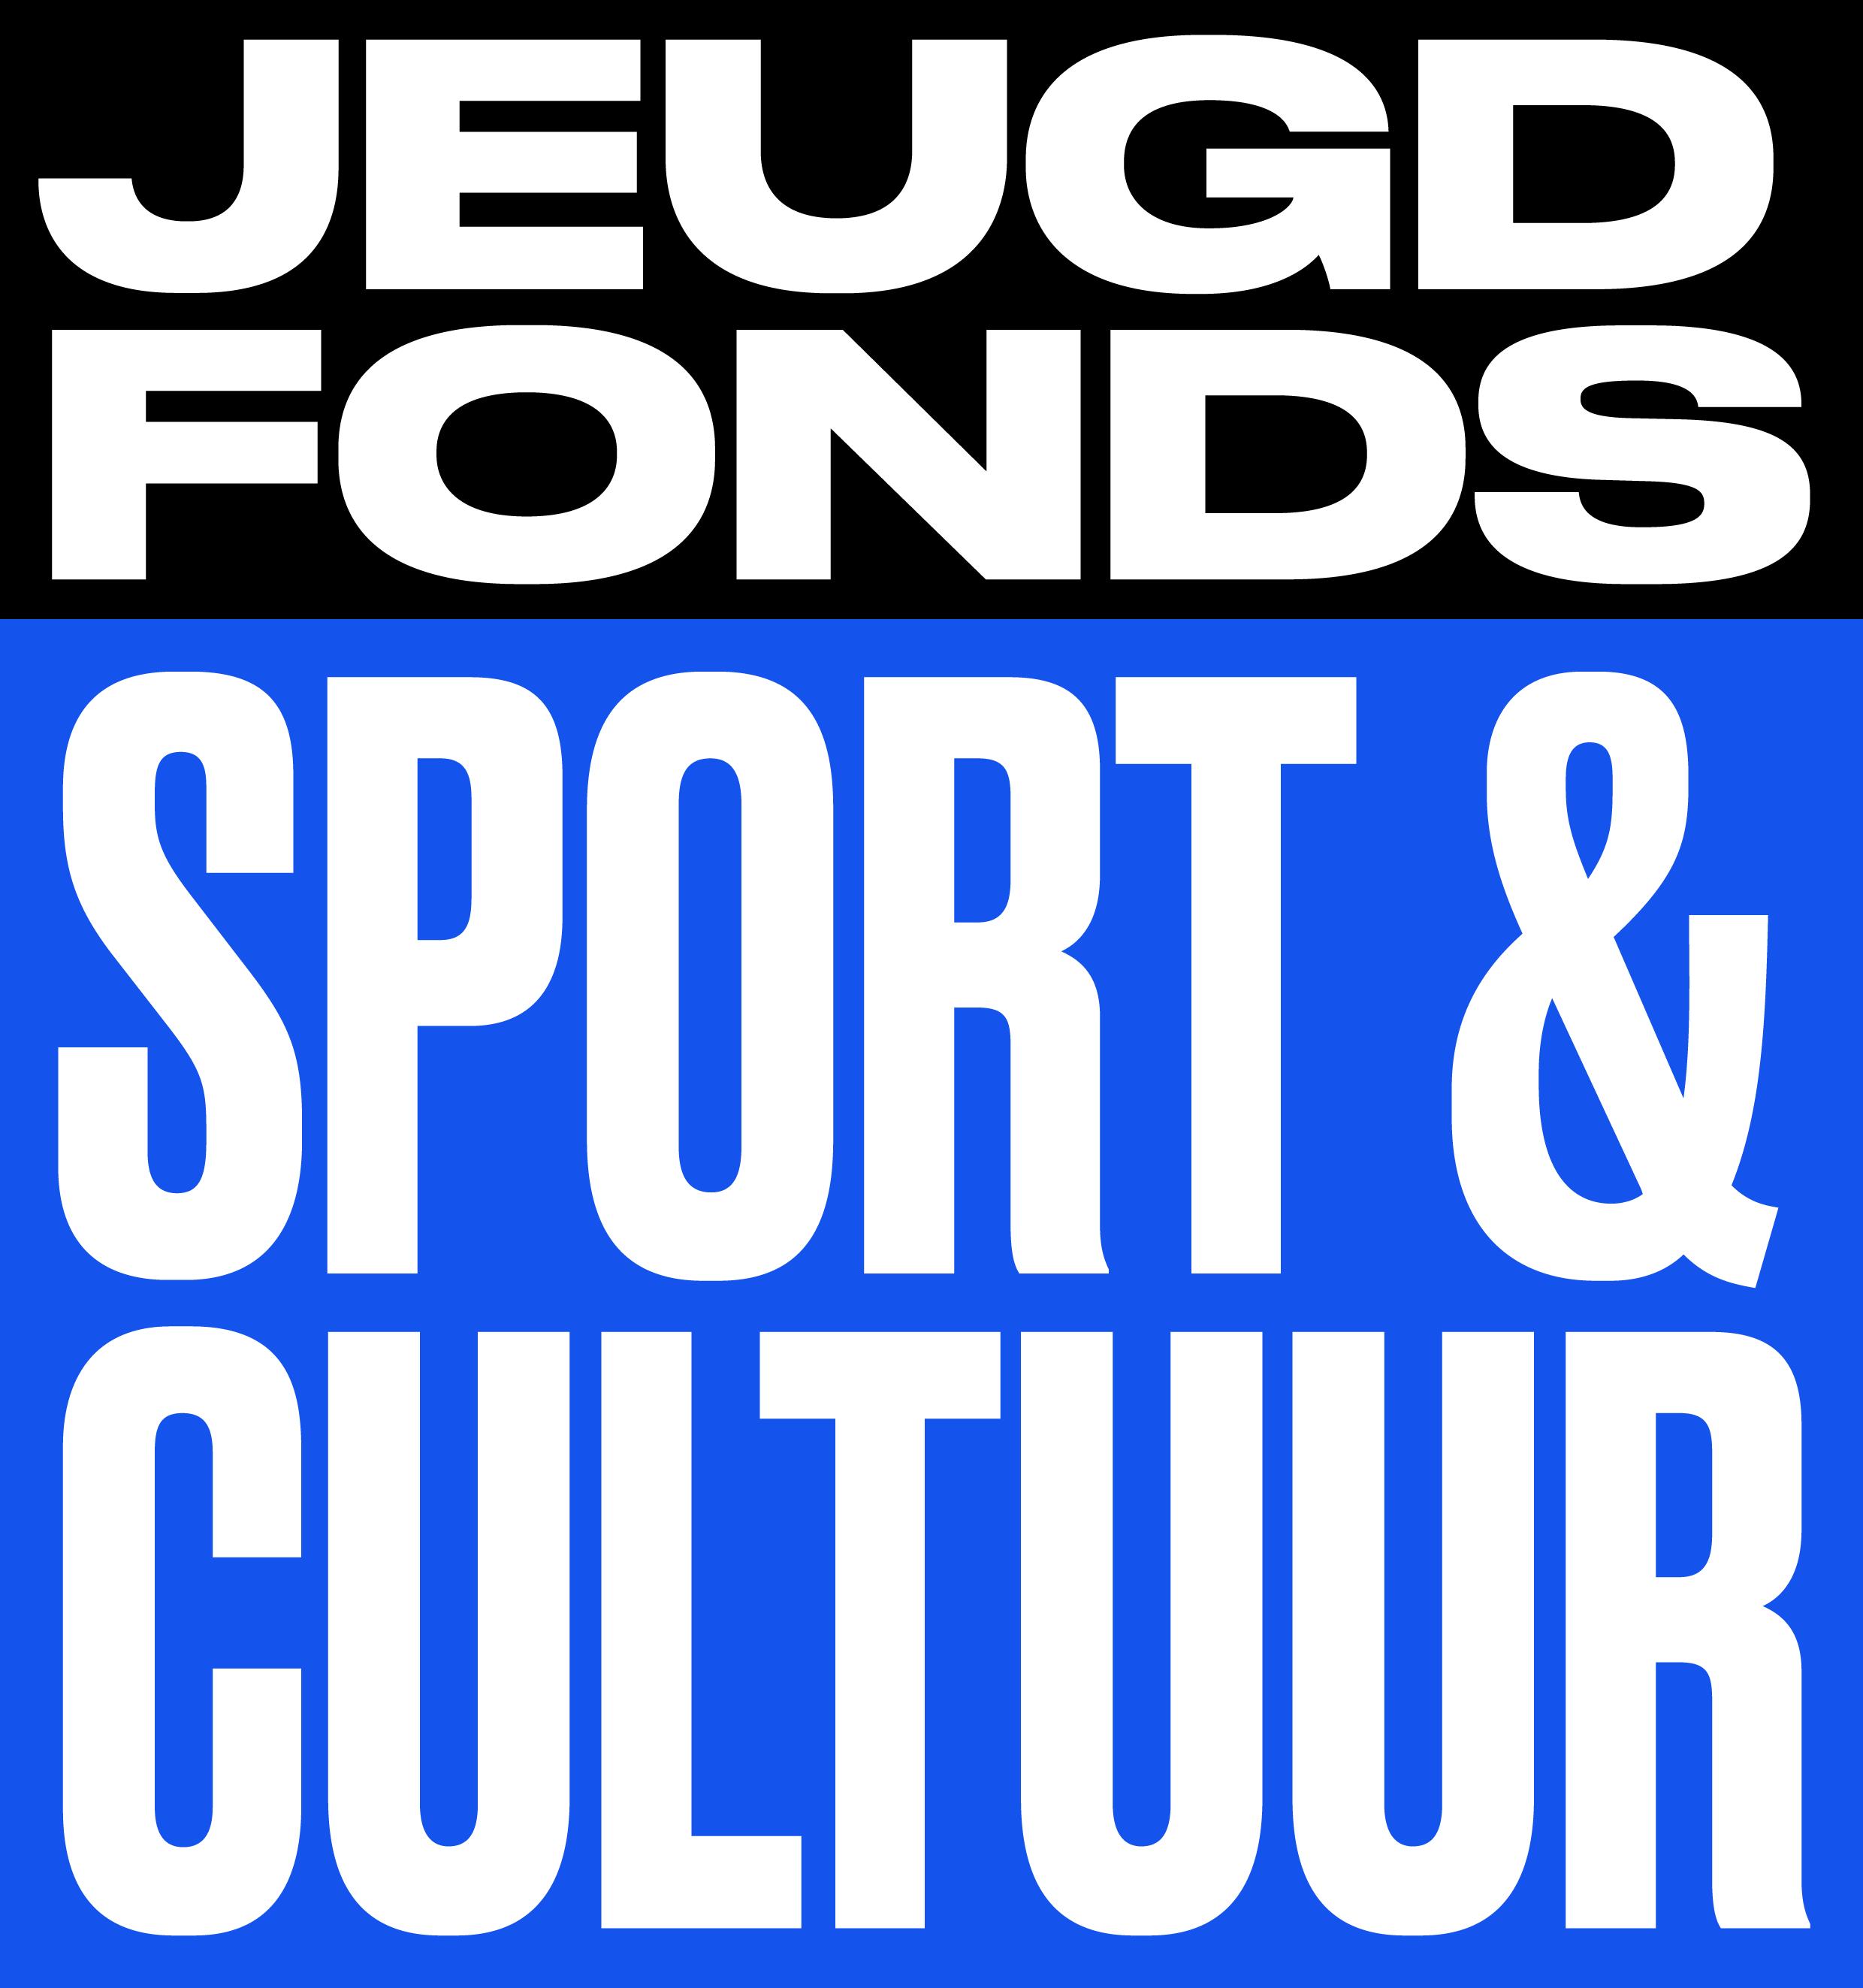 Het jeugdfonds Sport & Cultuur helpt!